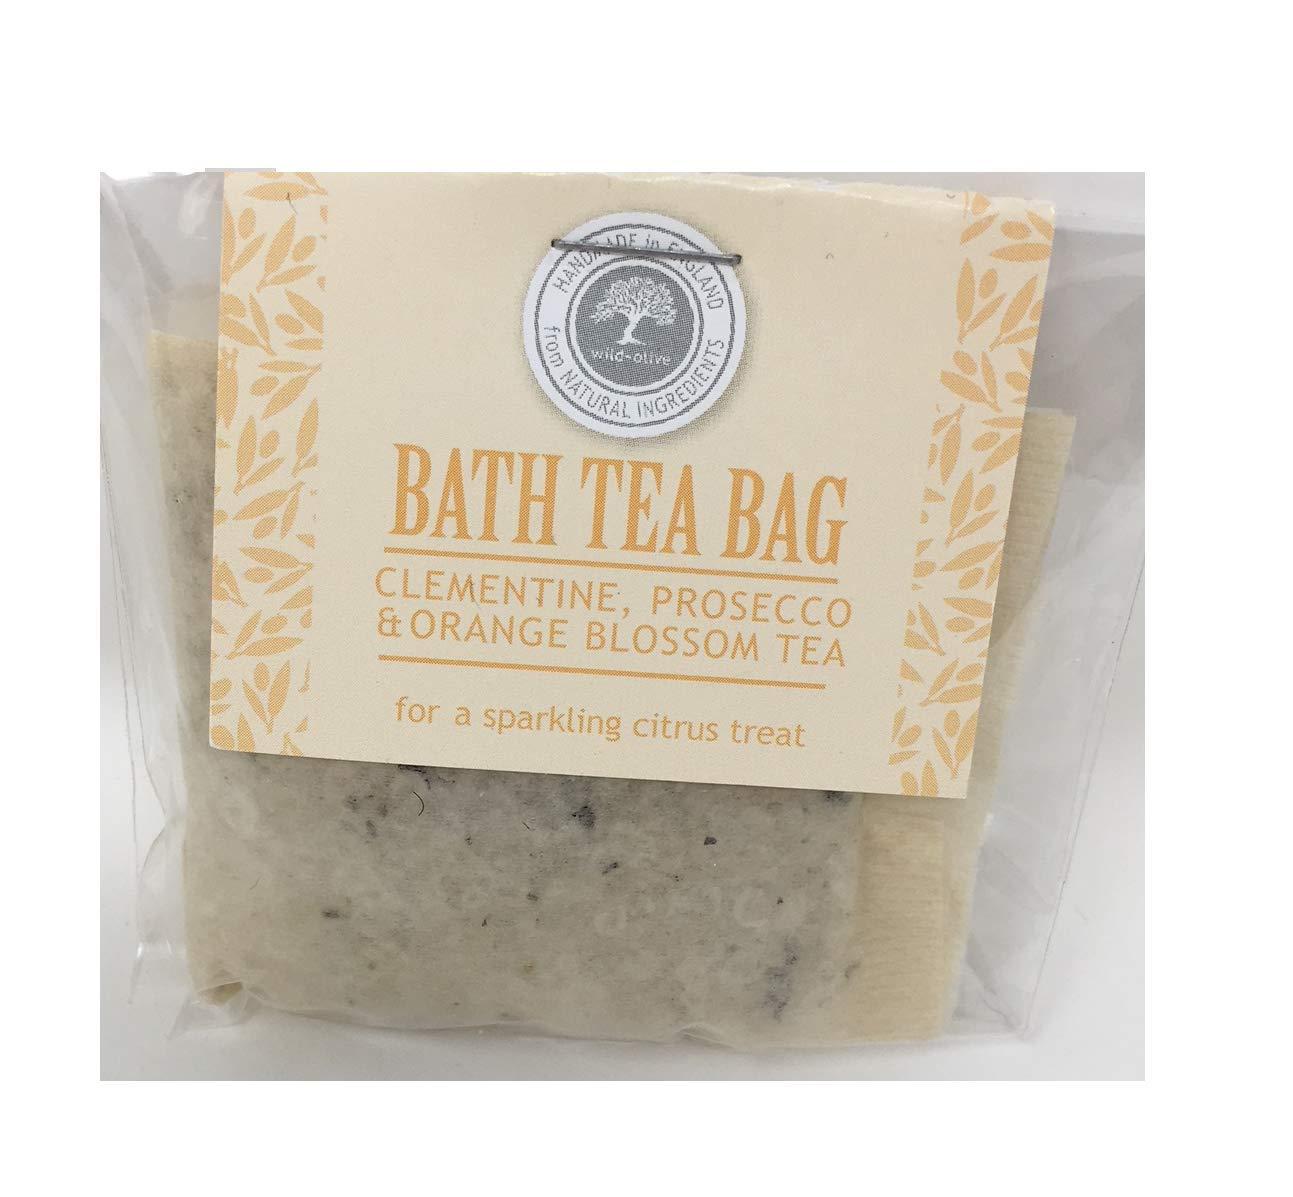 Clementine Prosecco and Orange Blossom Tea Festive Bath Tea Bag Wild Olive